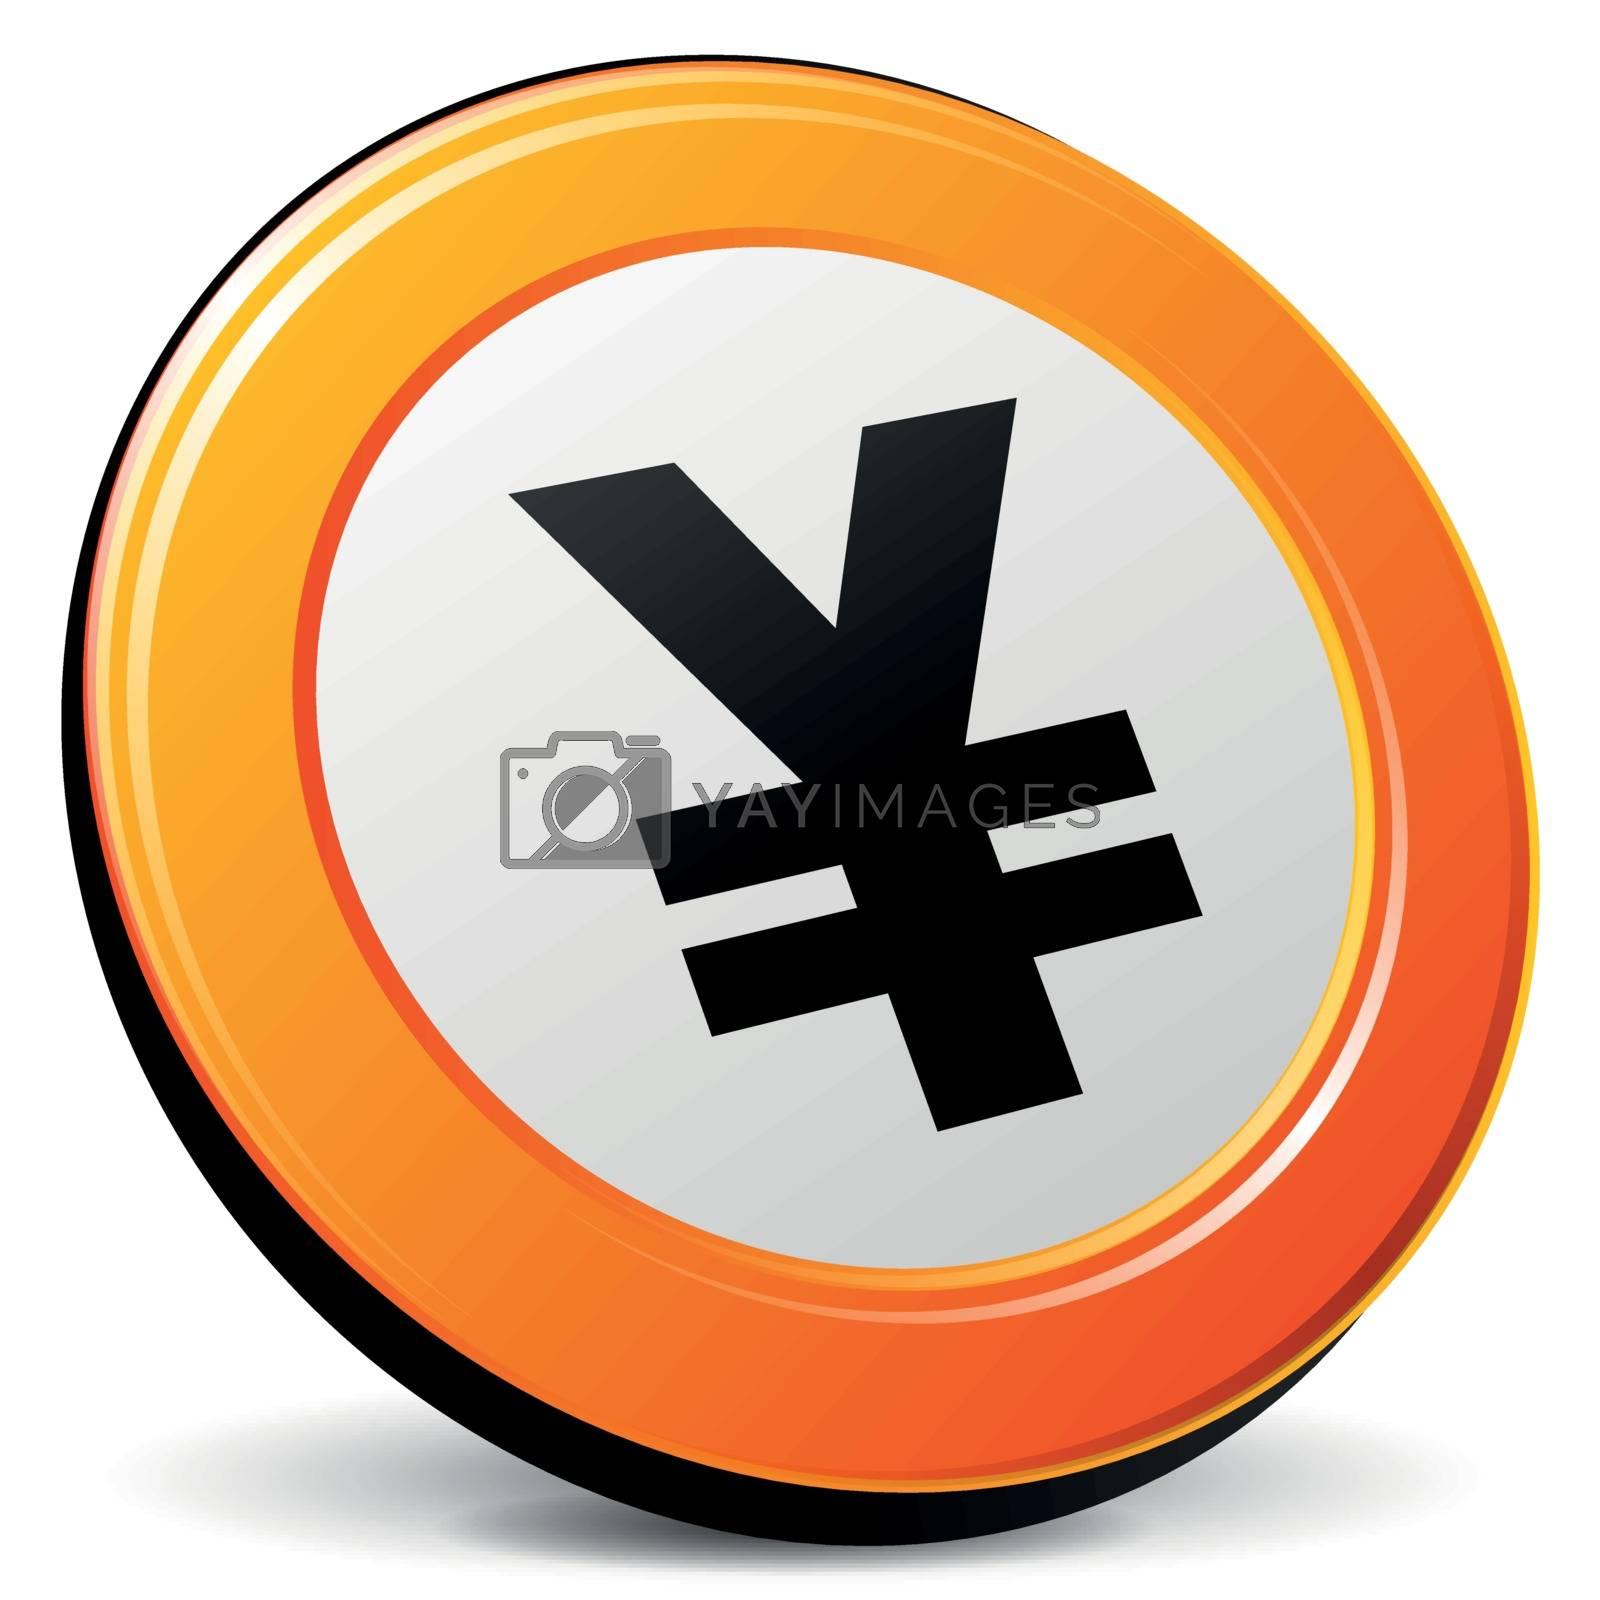 Royalty free image of Vector yen icon by nickylarson974